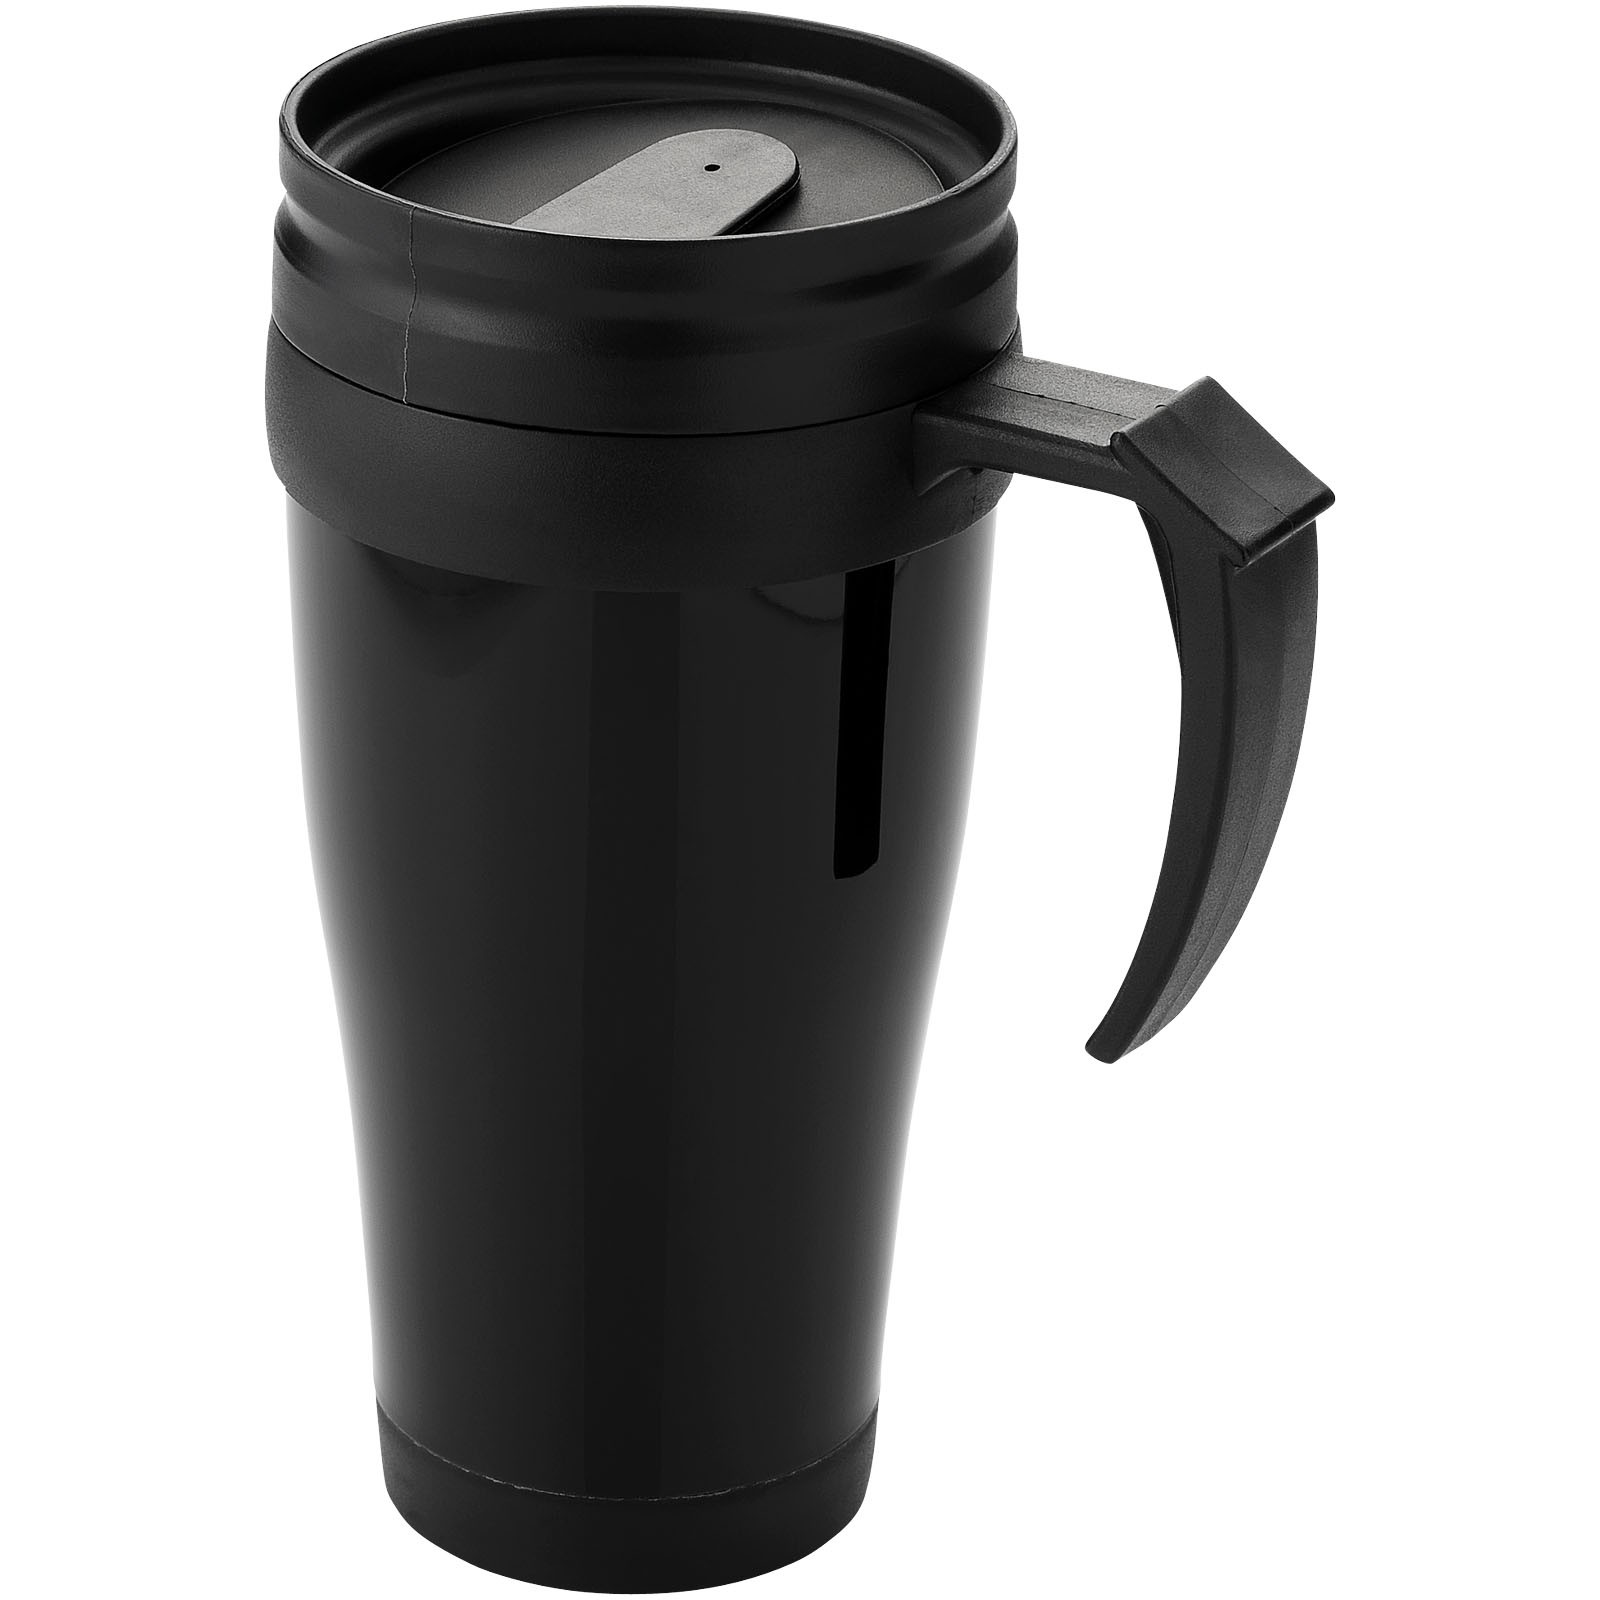 Daytona 400 ml insulated mug - Solid Black